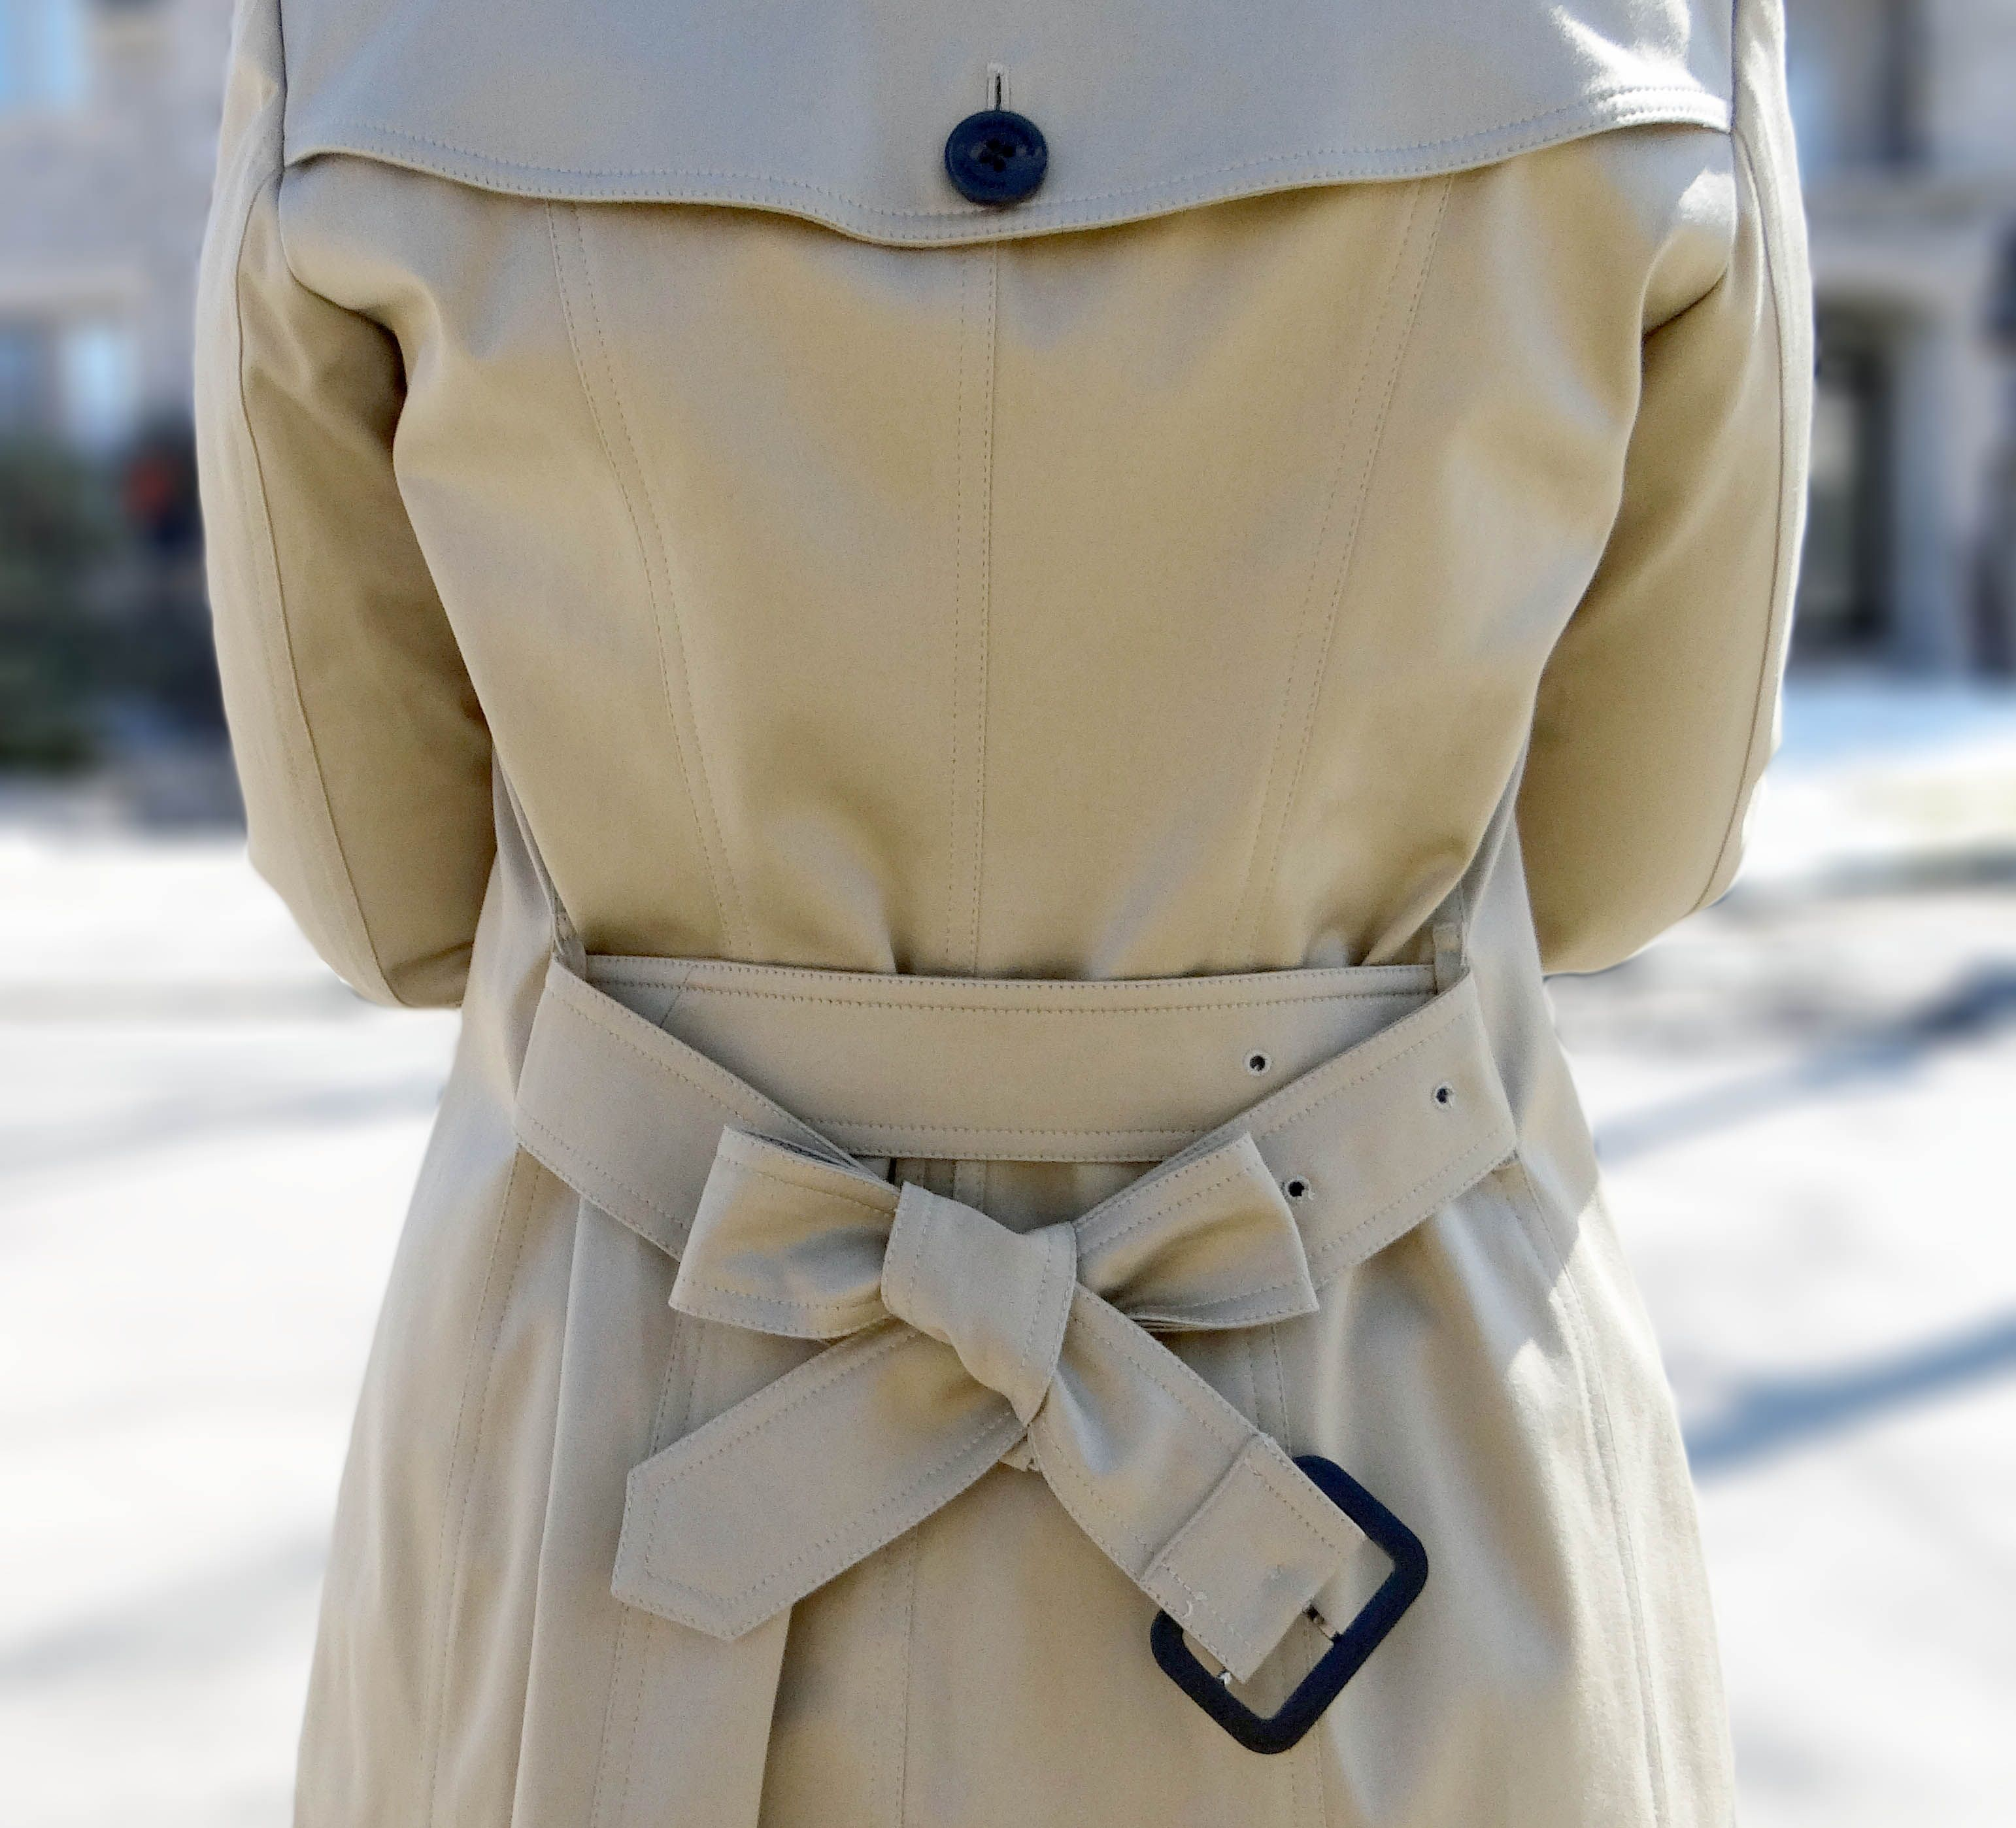 Burberry Designer News - Classic Bags, Trench Coat ...